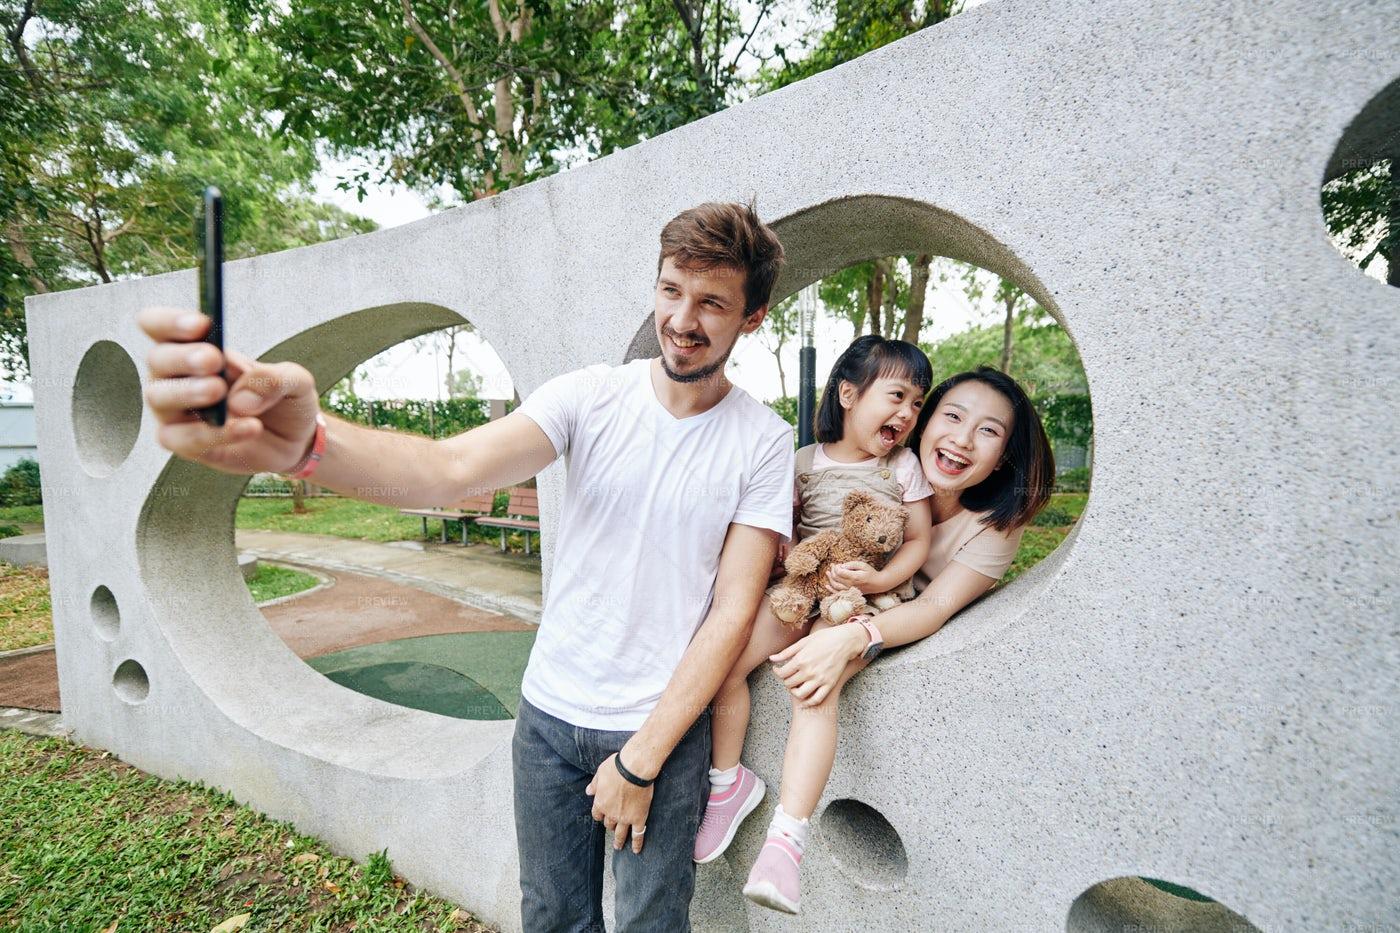 Selfie With Family: Stock Photos